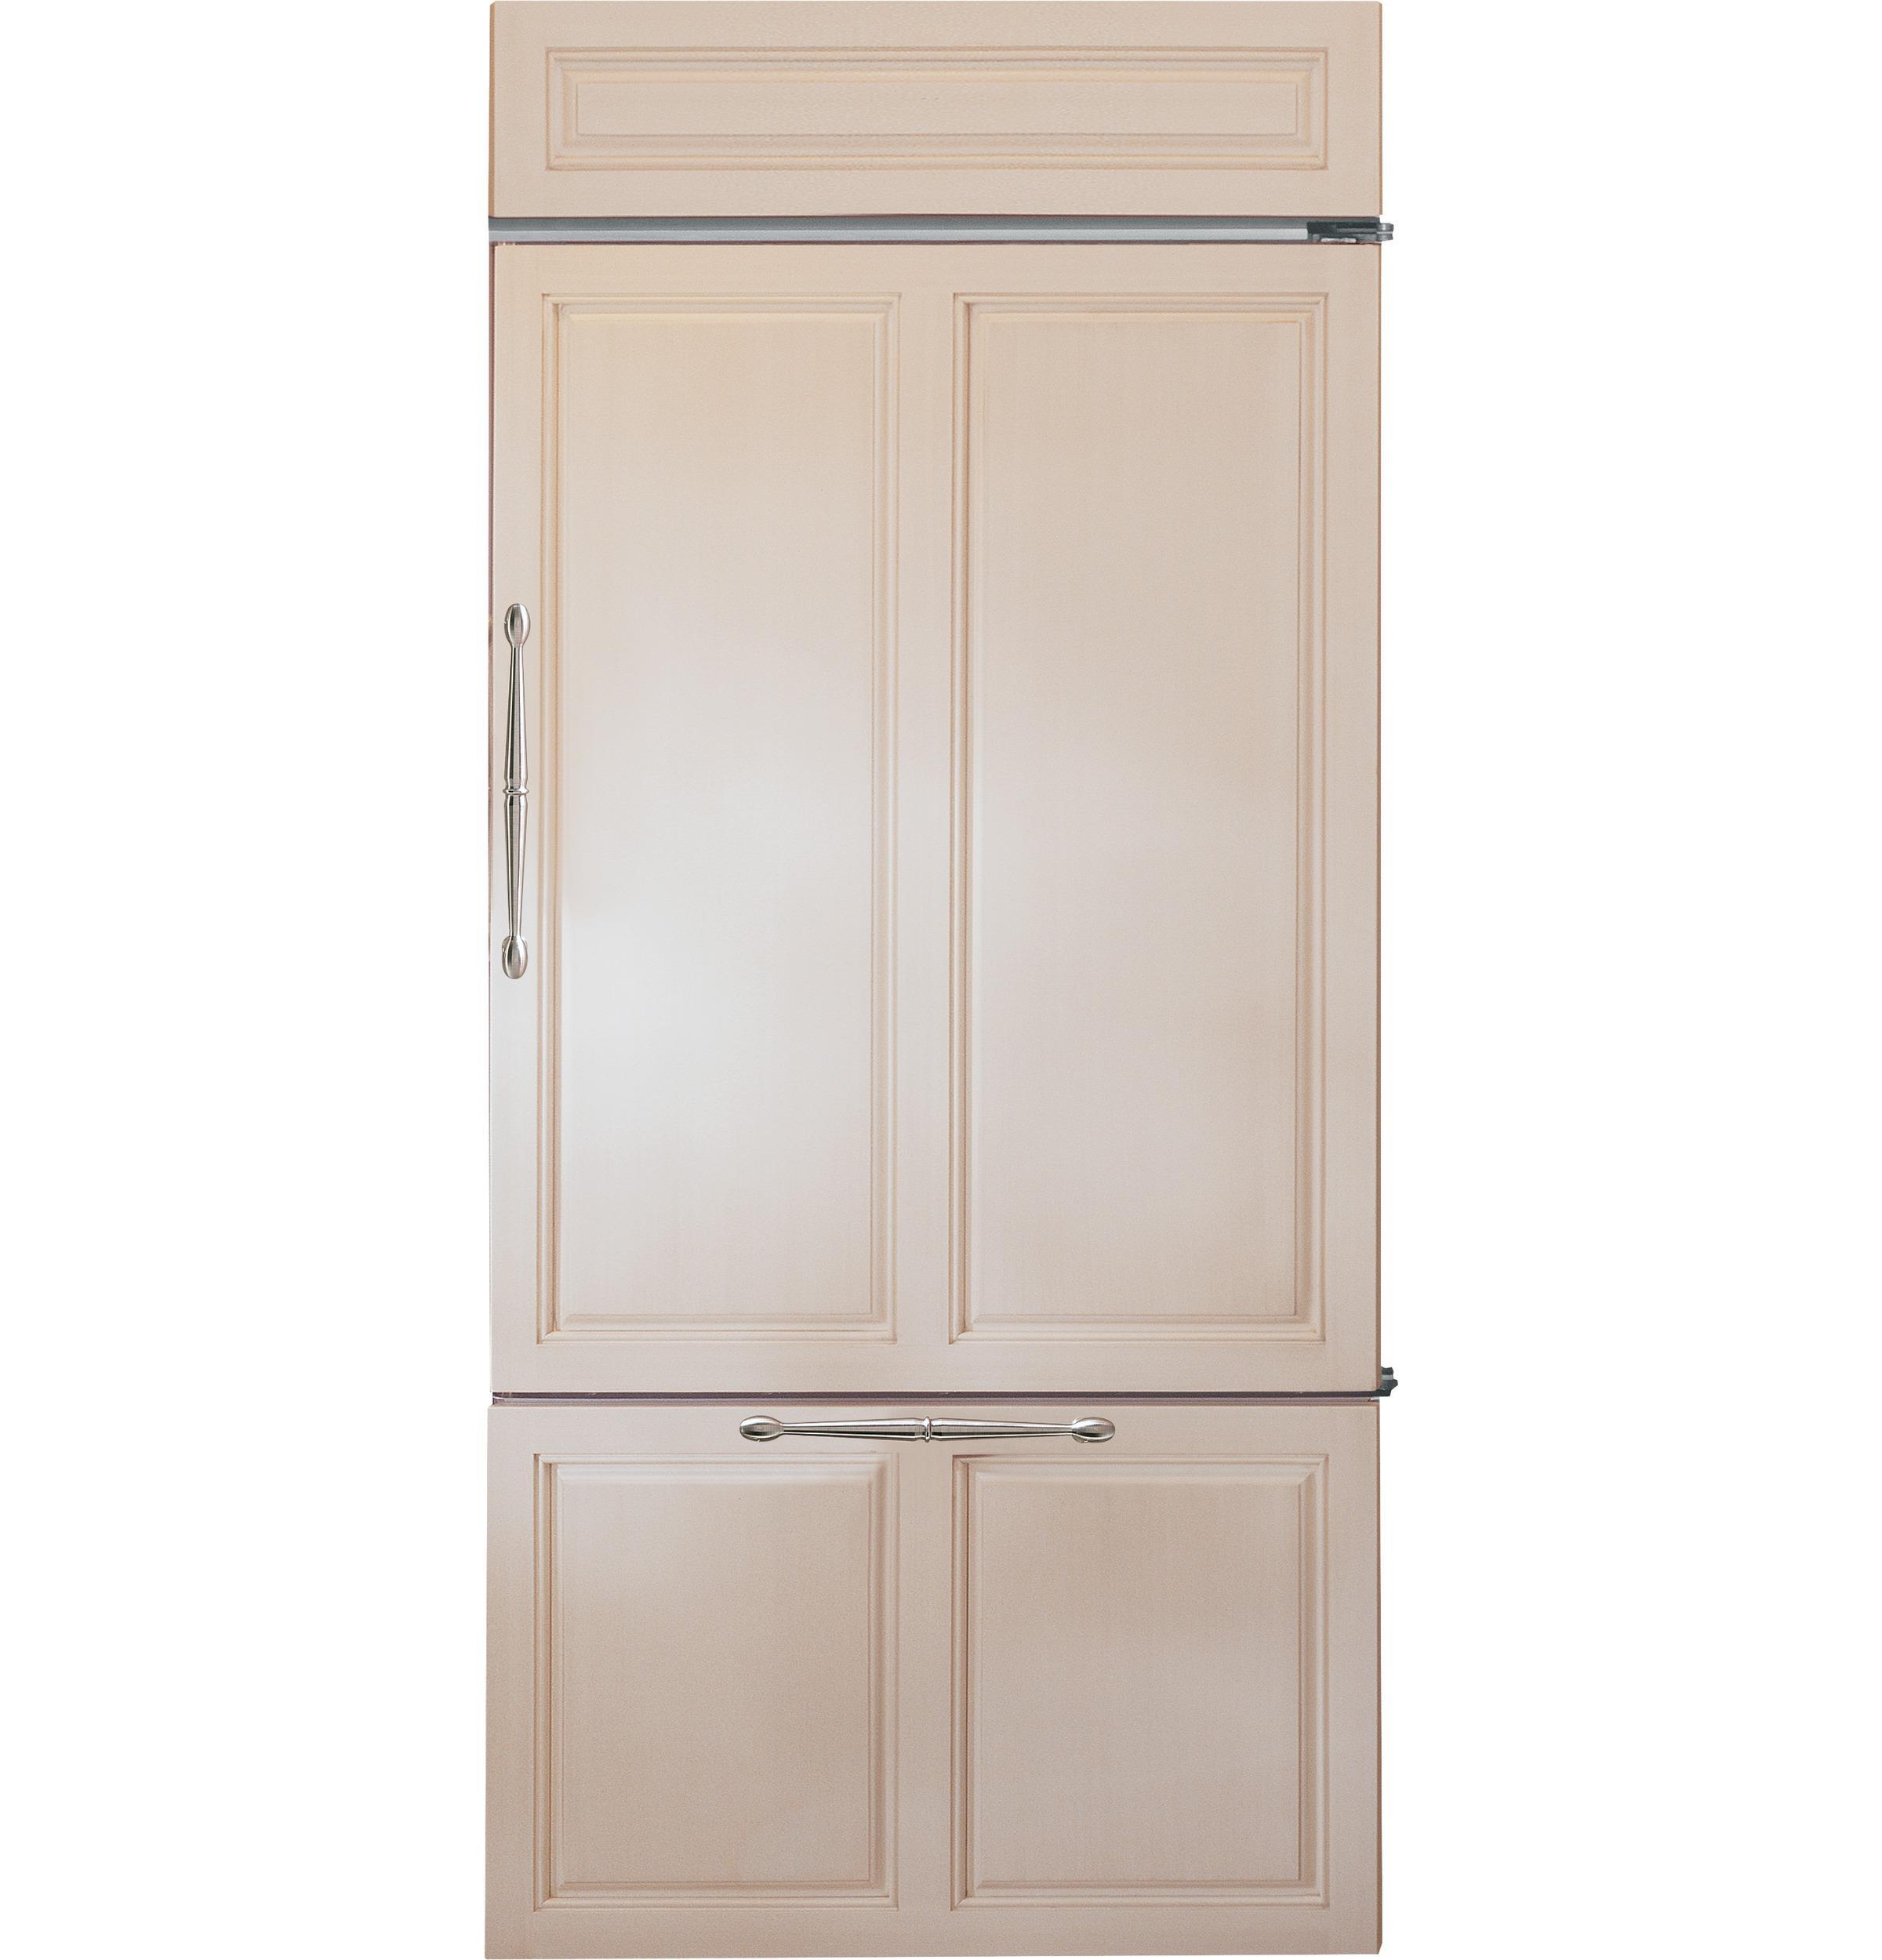 "21.33 cu. ft 36"" Bottom-Freezer Refrigerator"